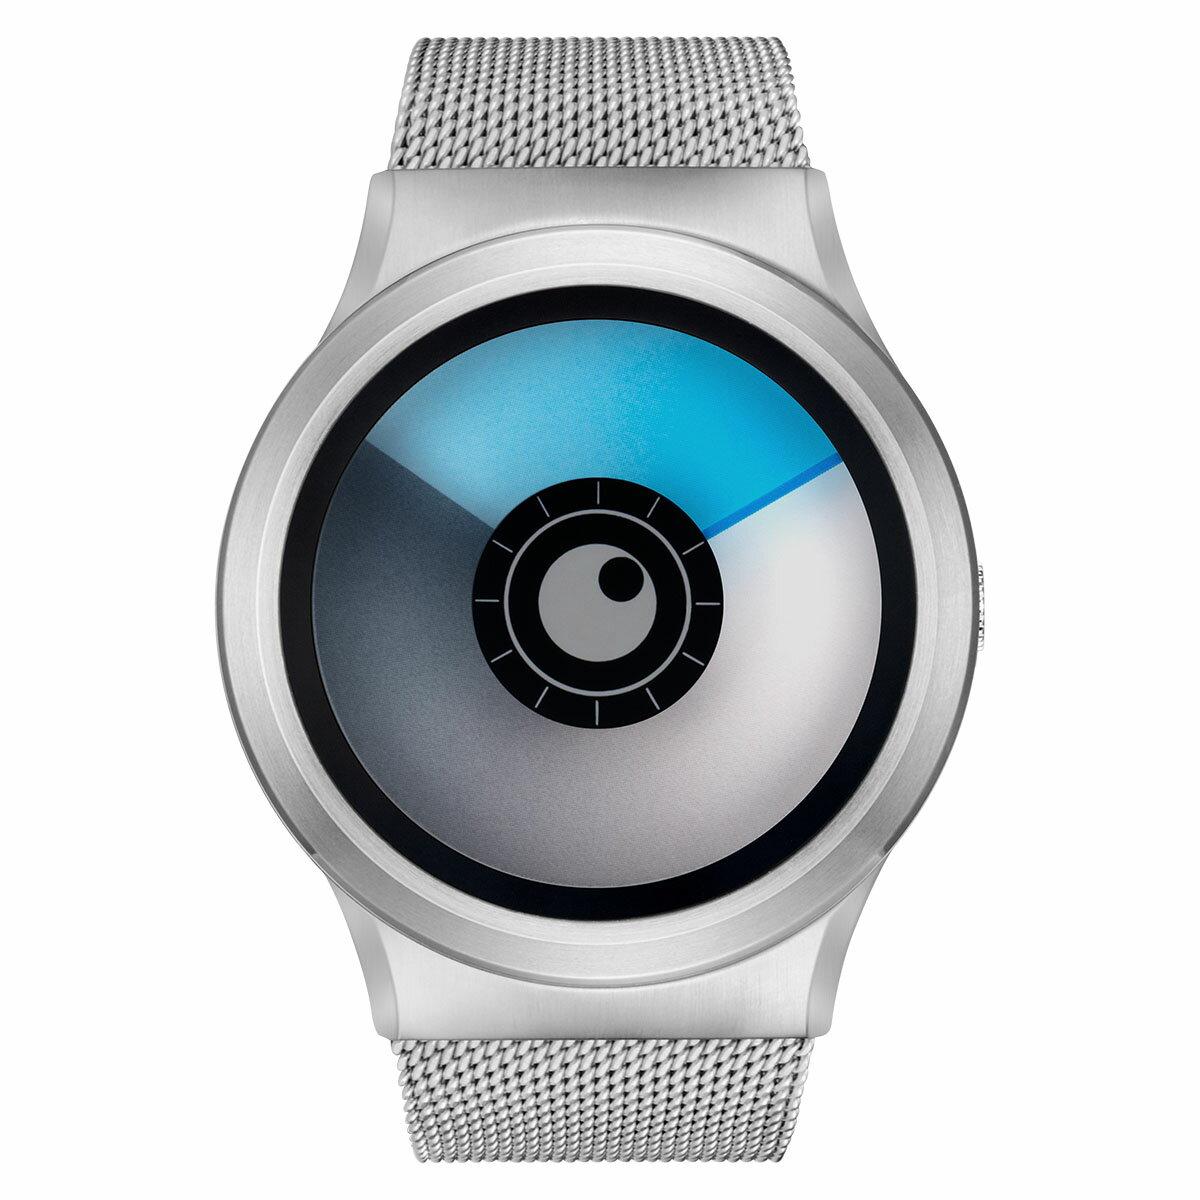 ZEROO AURORA BOREALIS ゼロ 電池式クォーツ 腕時計 [W12024B01SM01] ブルー デザインウォッチ ペア用 メンズ レディース ユニセックス おしゃれ時計 デザイナーズ